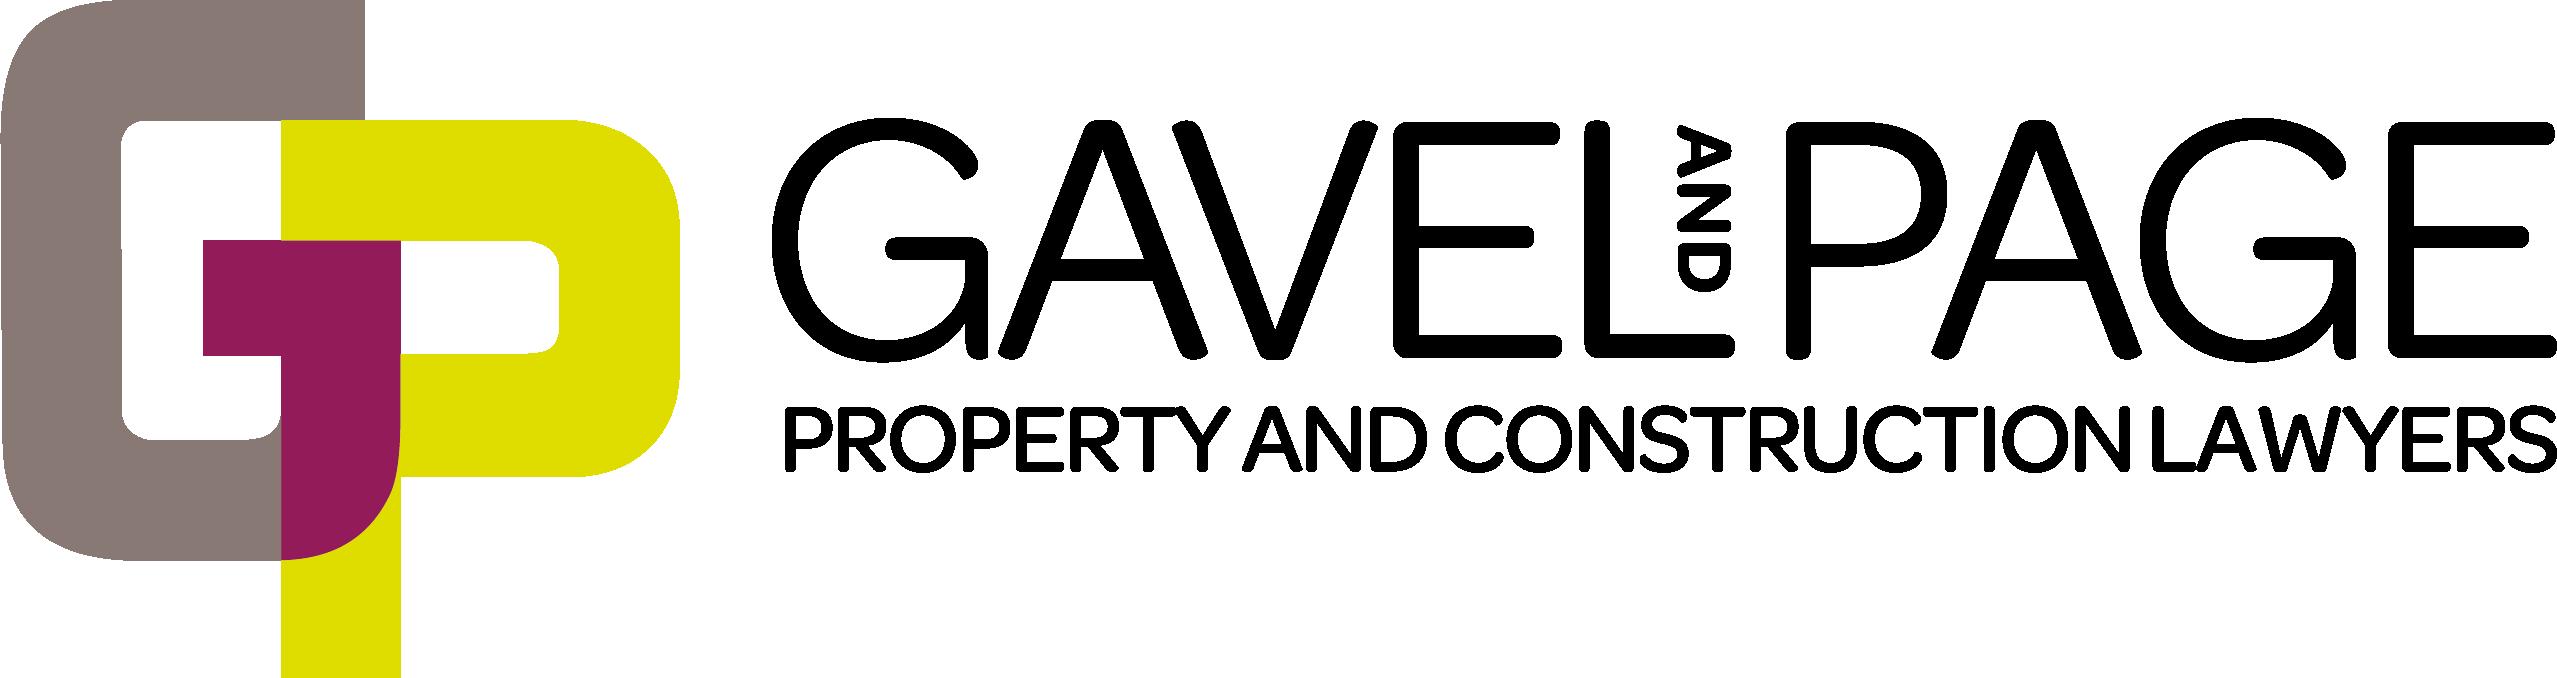 GavelPage_Logo_CMYK